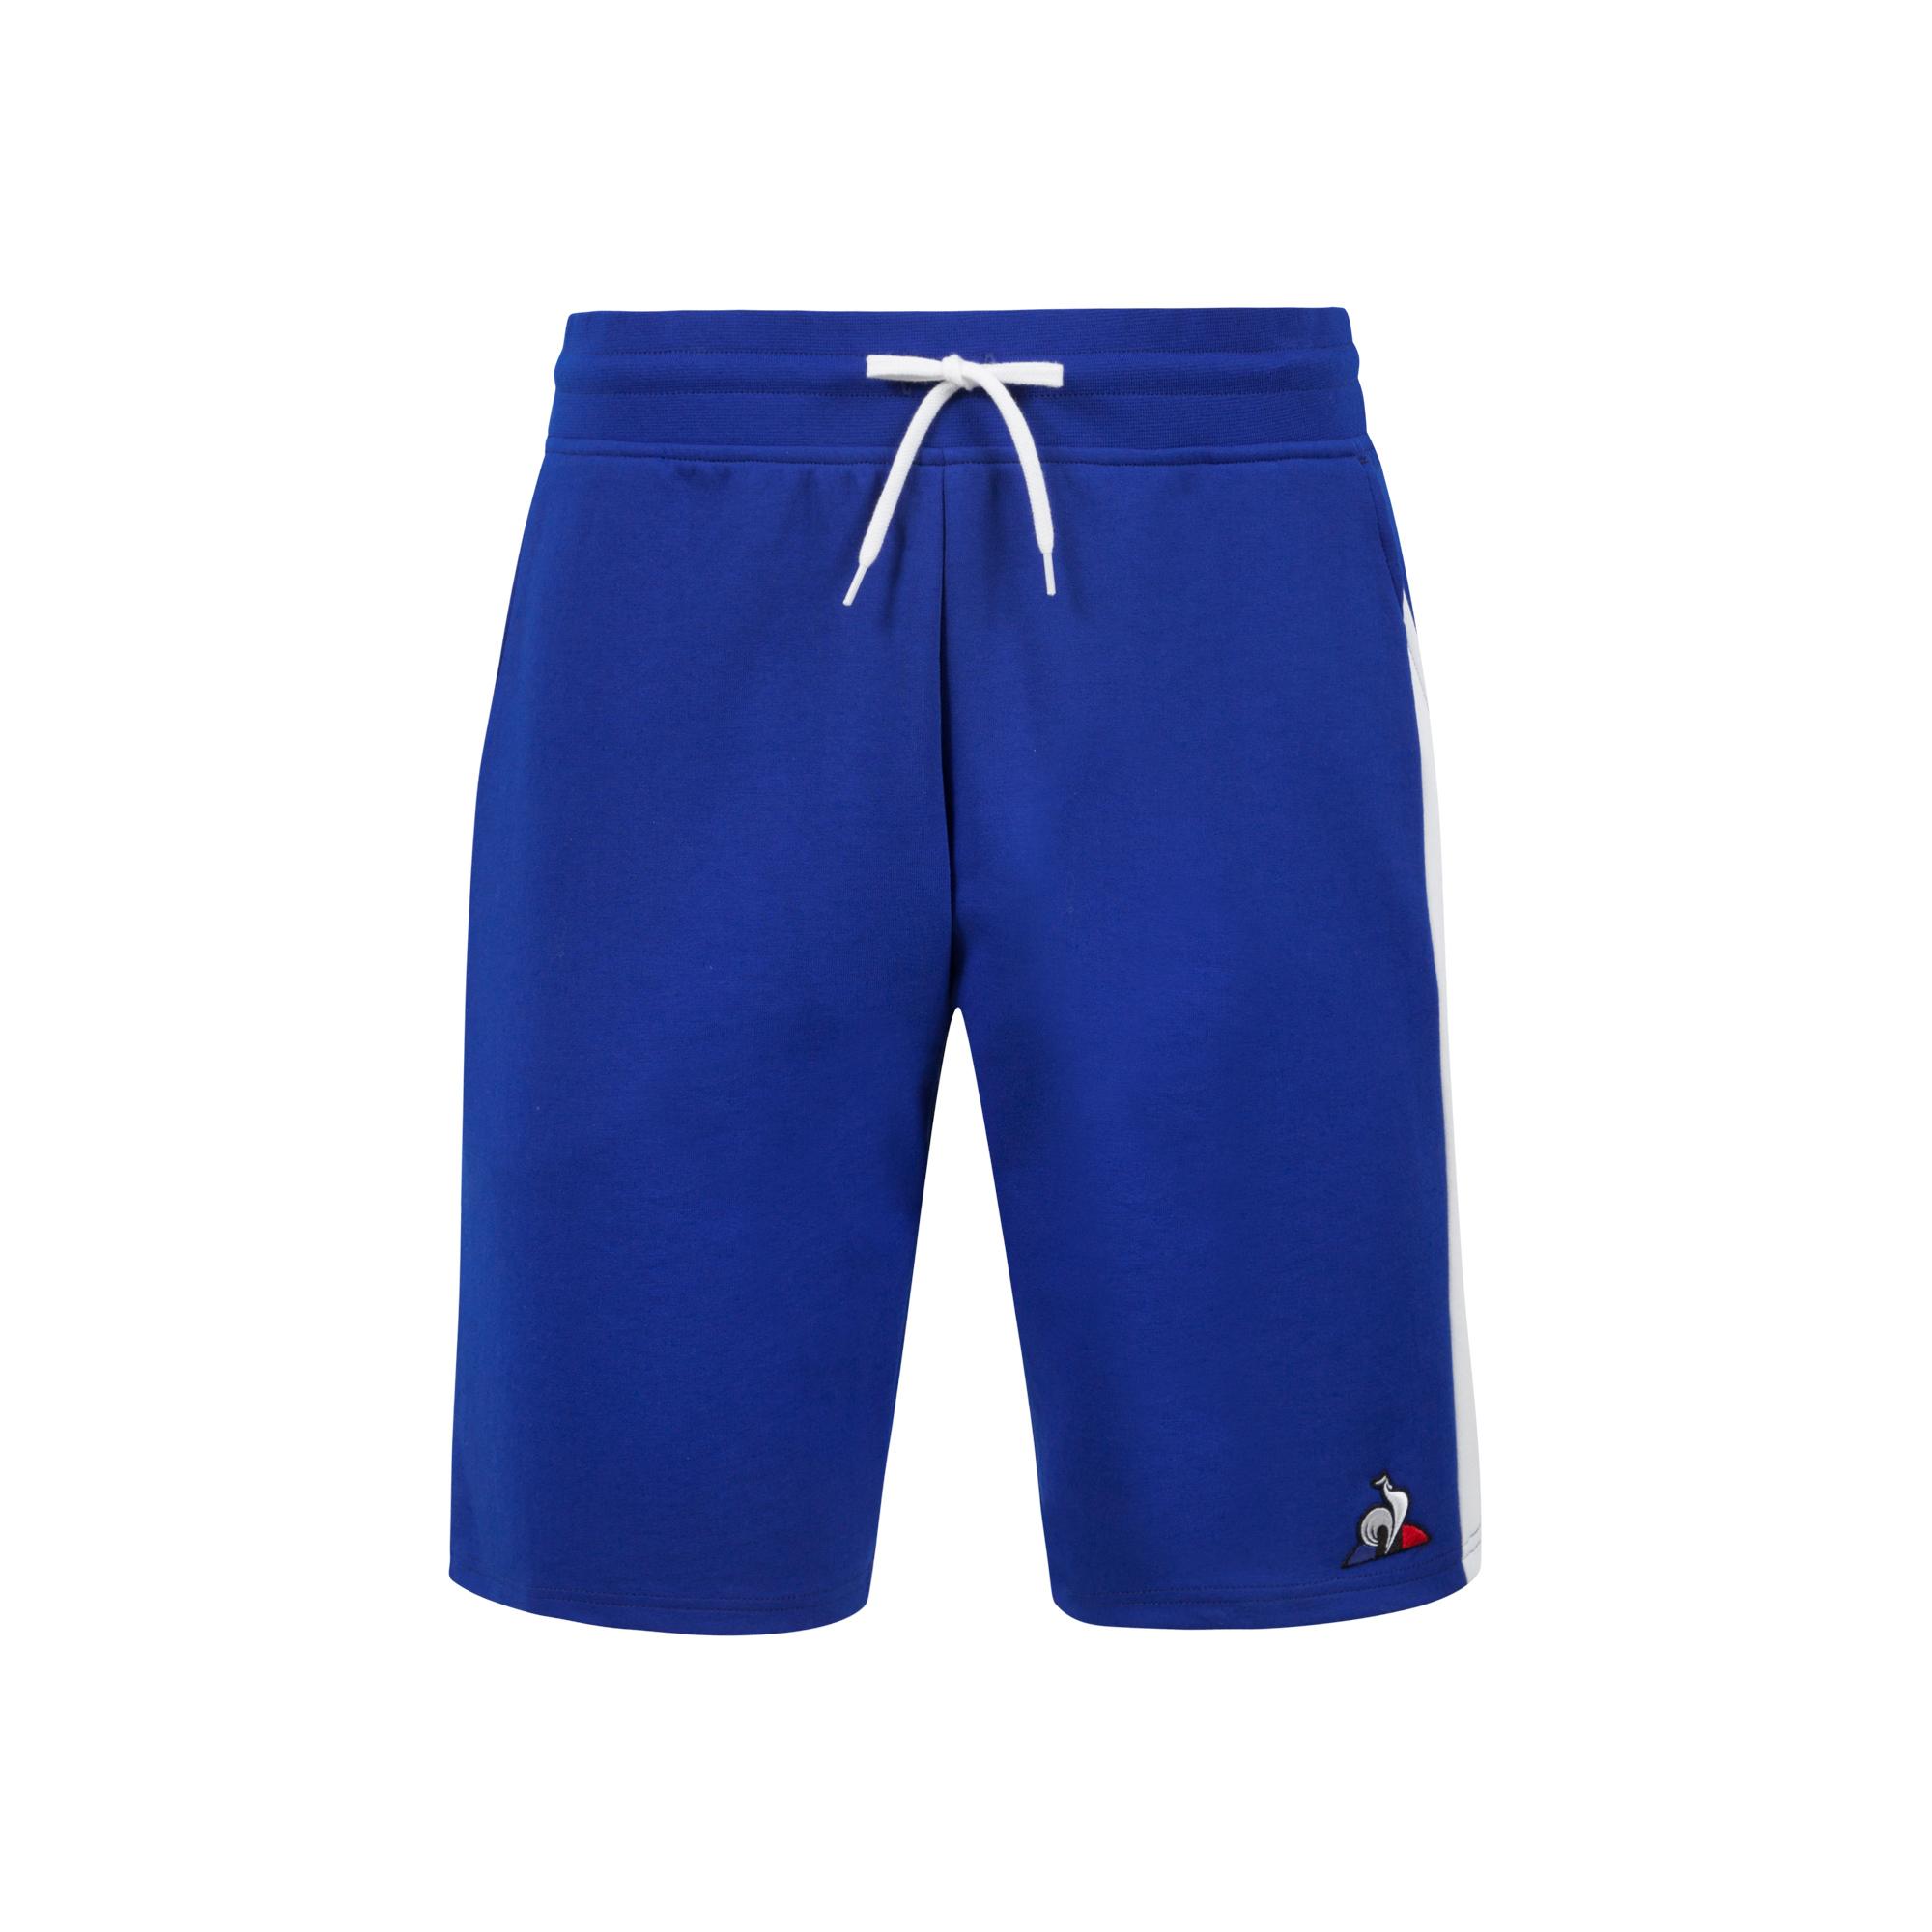 Le Coq Sportif Shorts SAISON 2 Regular N°1 blue